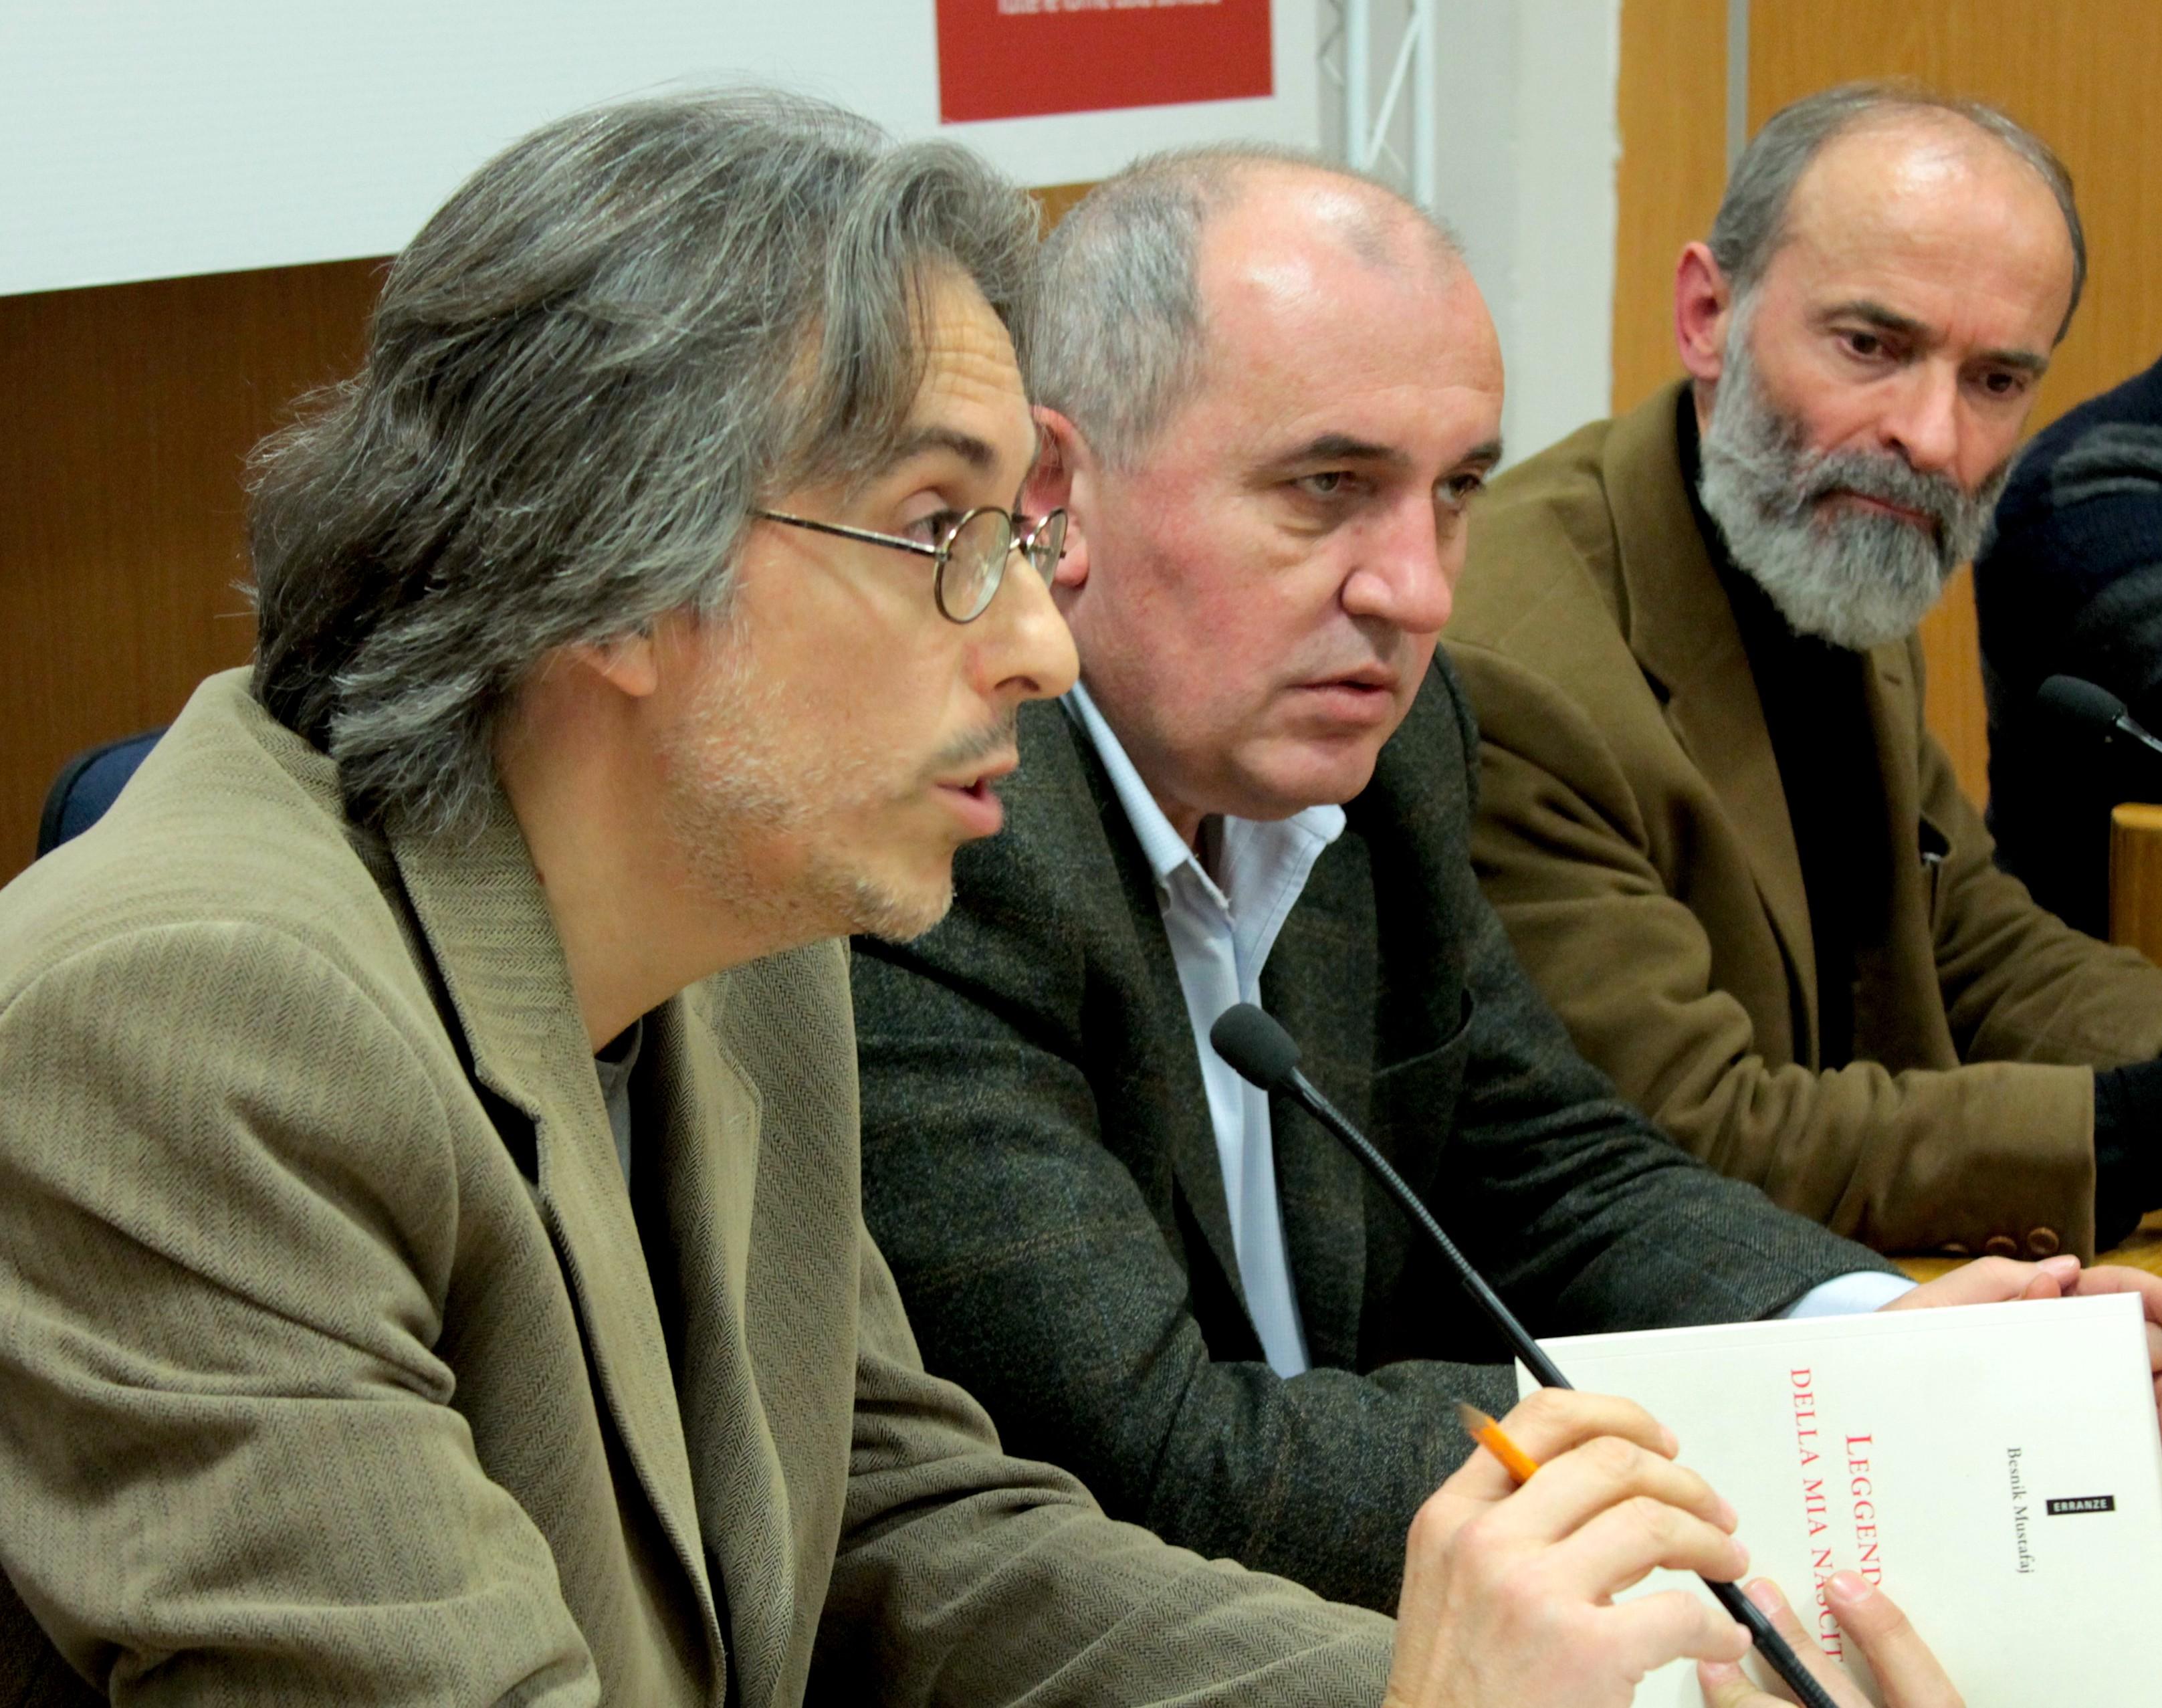 Besnik Mustafaj - 2006 Mantova